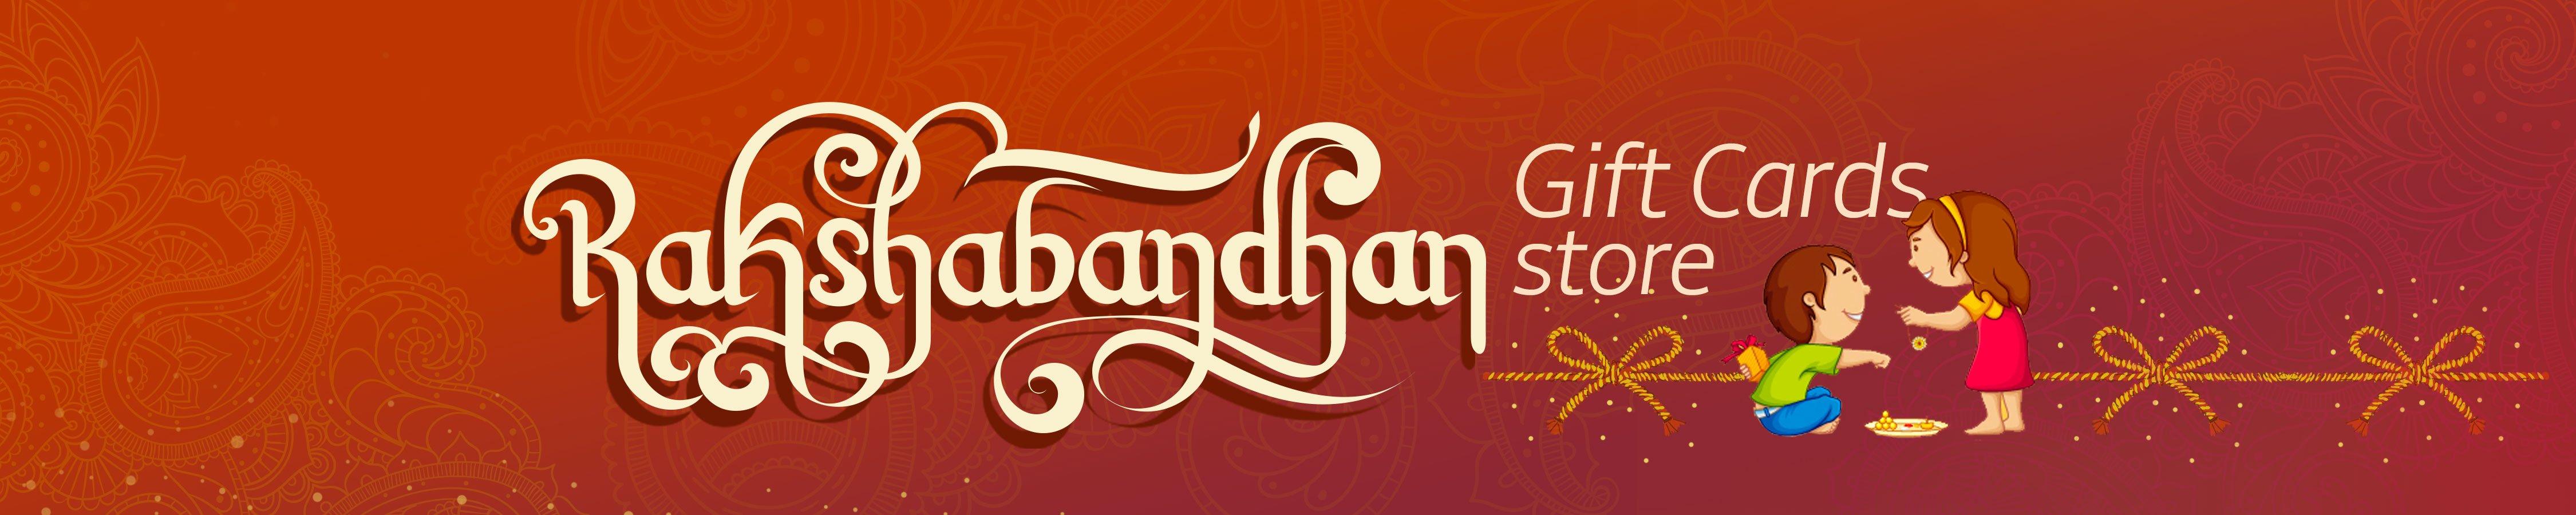 Raksha Bandhan Store